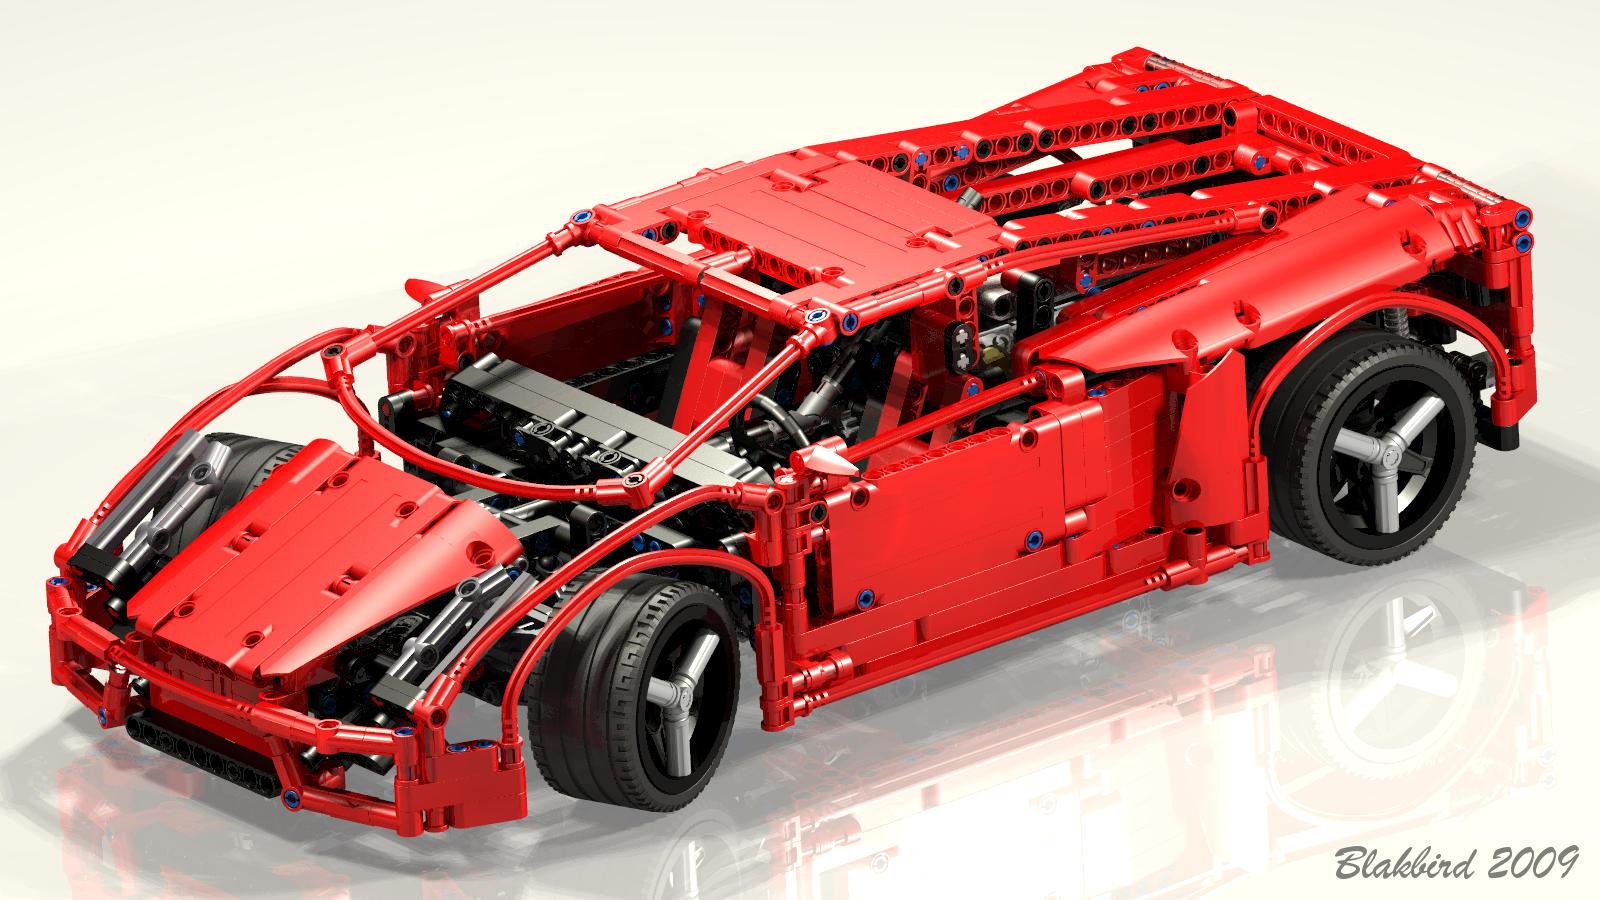 Lego gallardo kp560-4 polizia instructions 8214, racers.